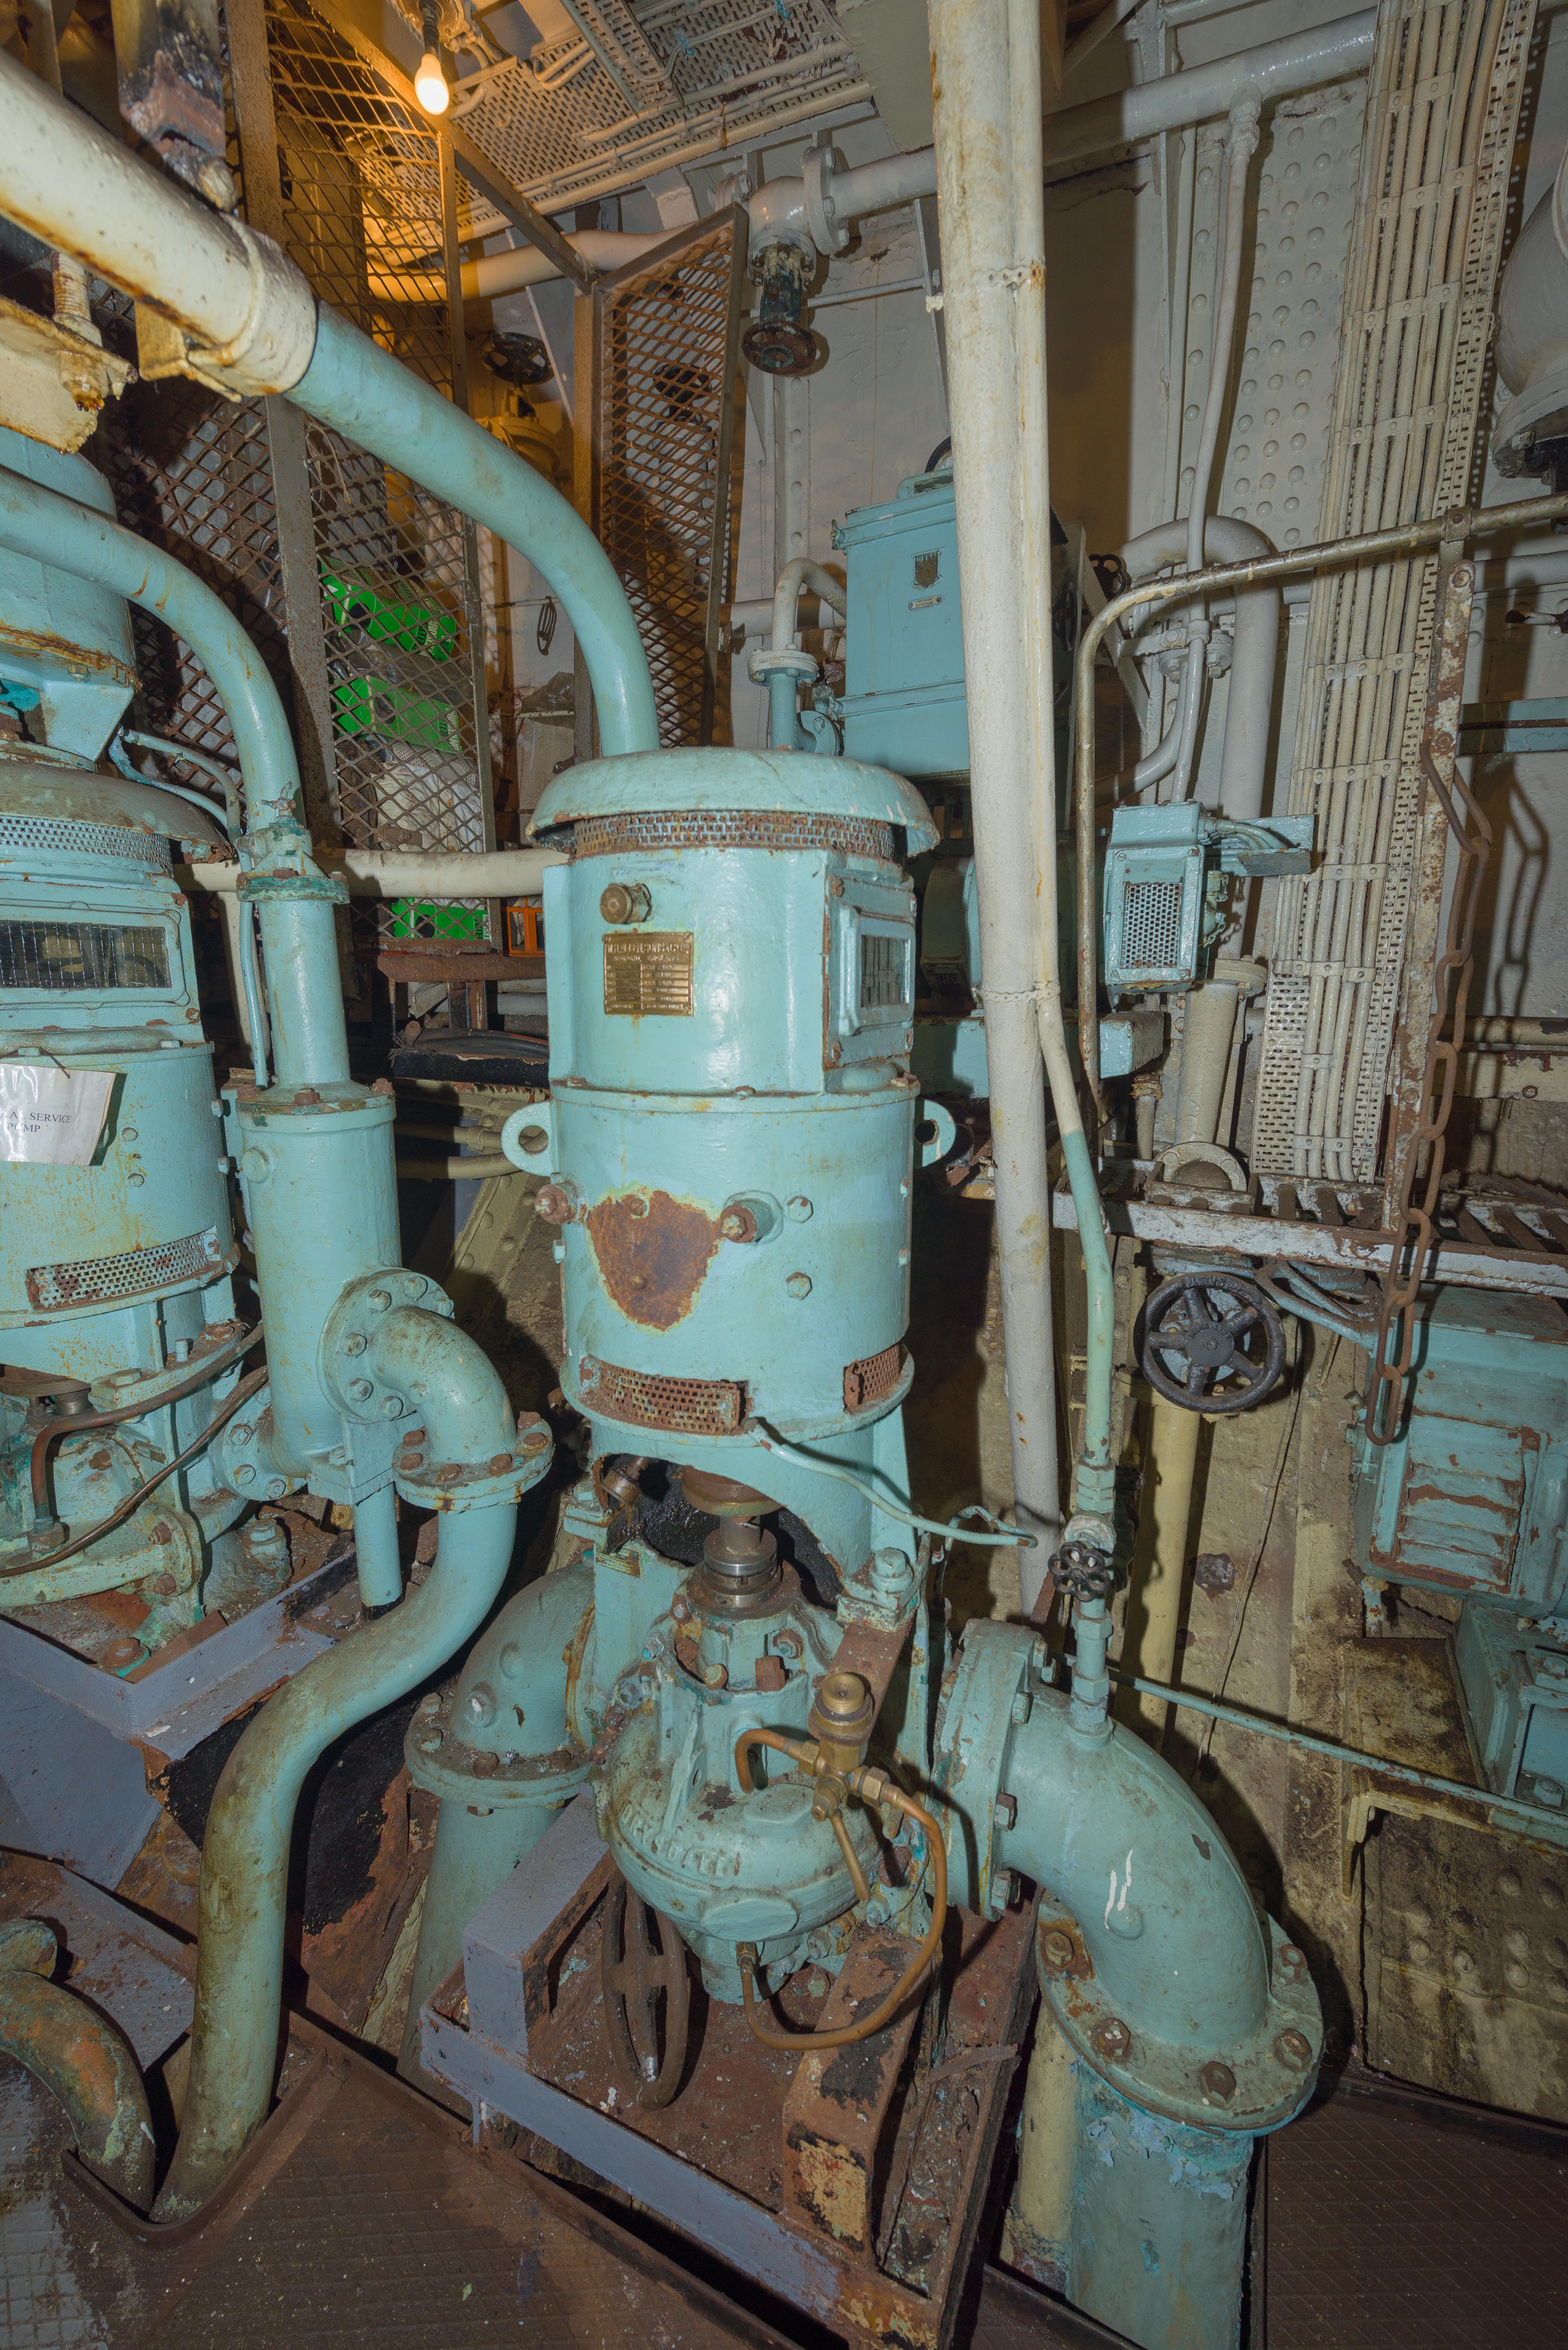 SS Explorer Condenser Circulating Pump